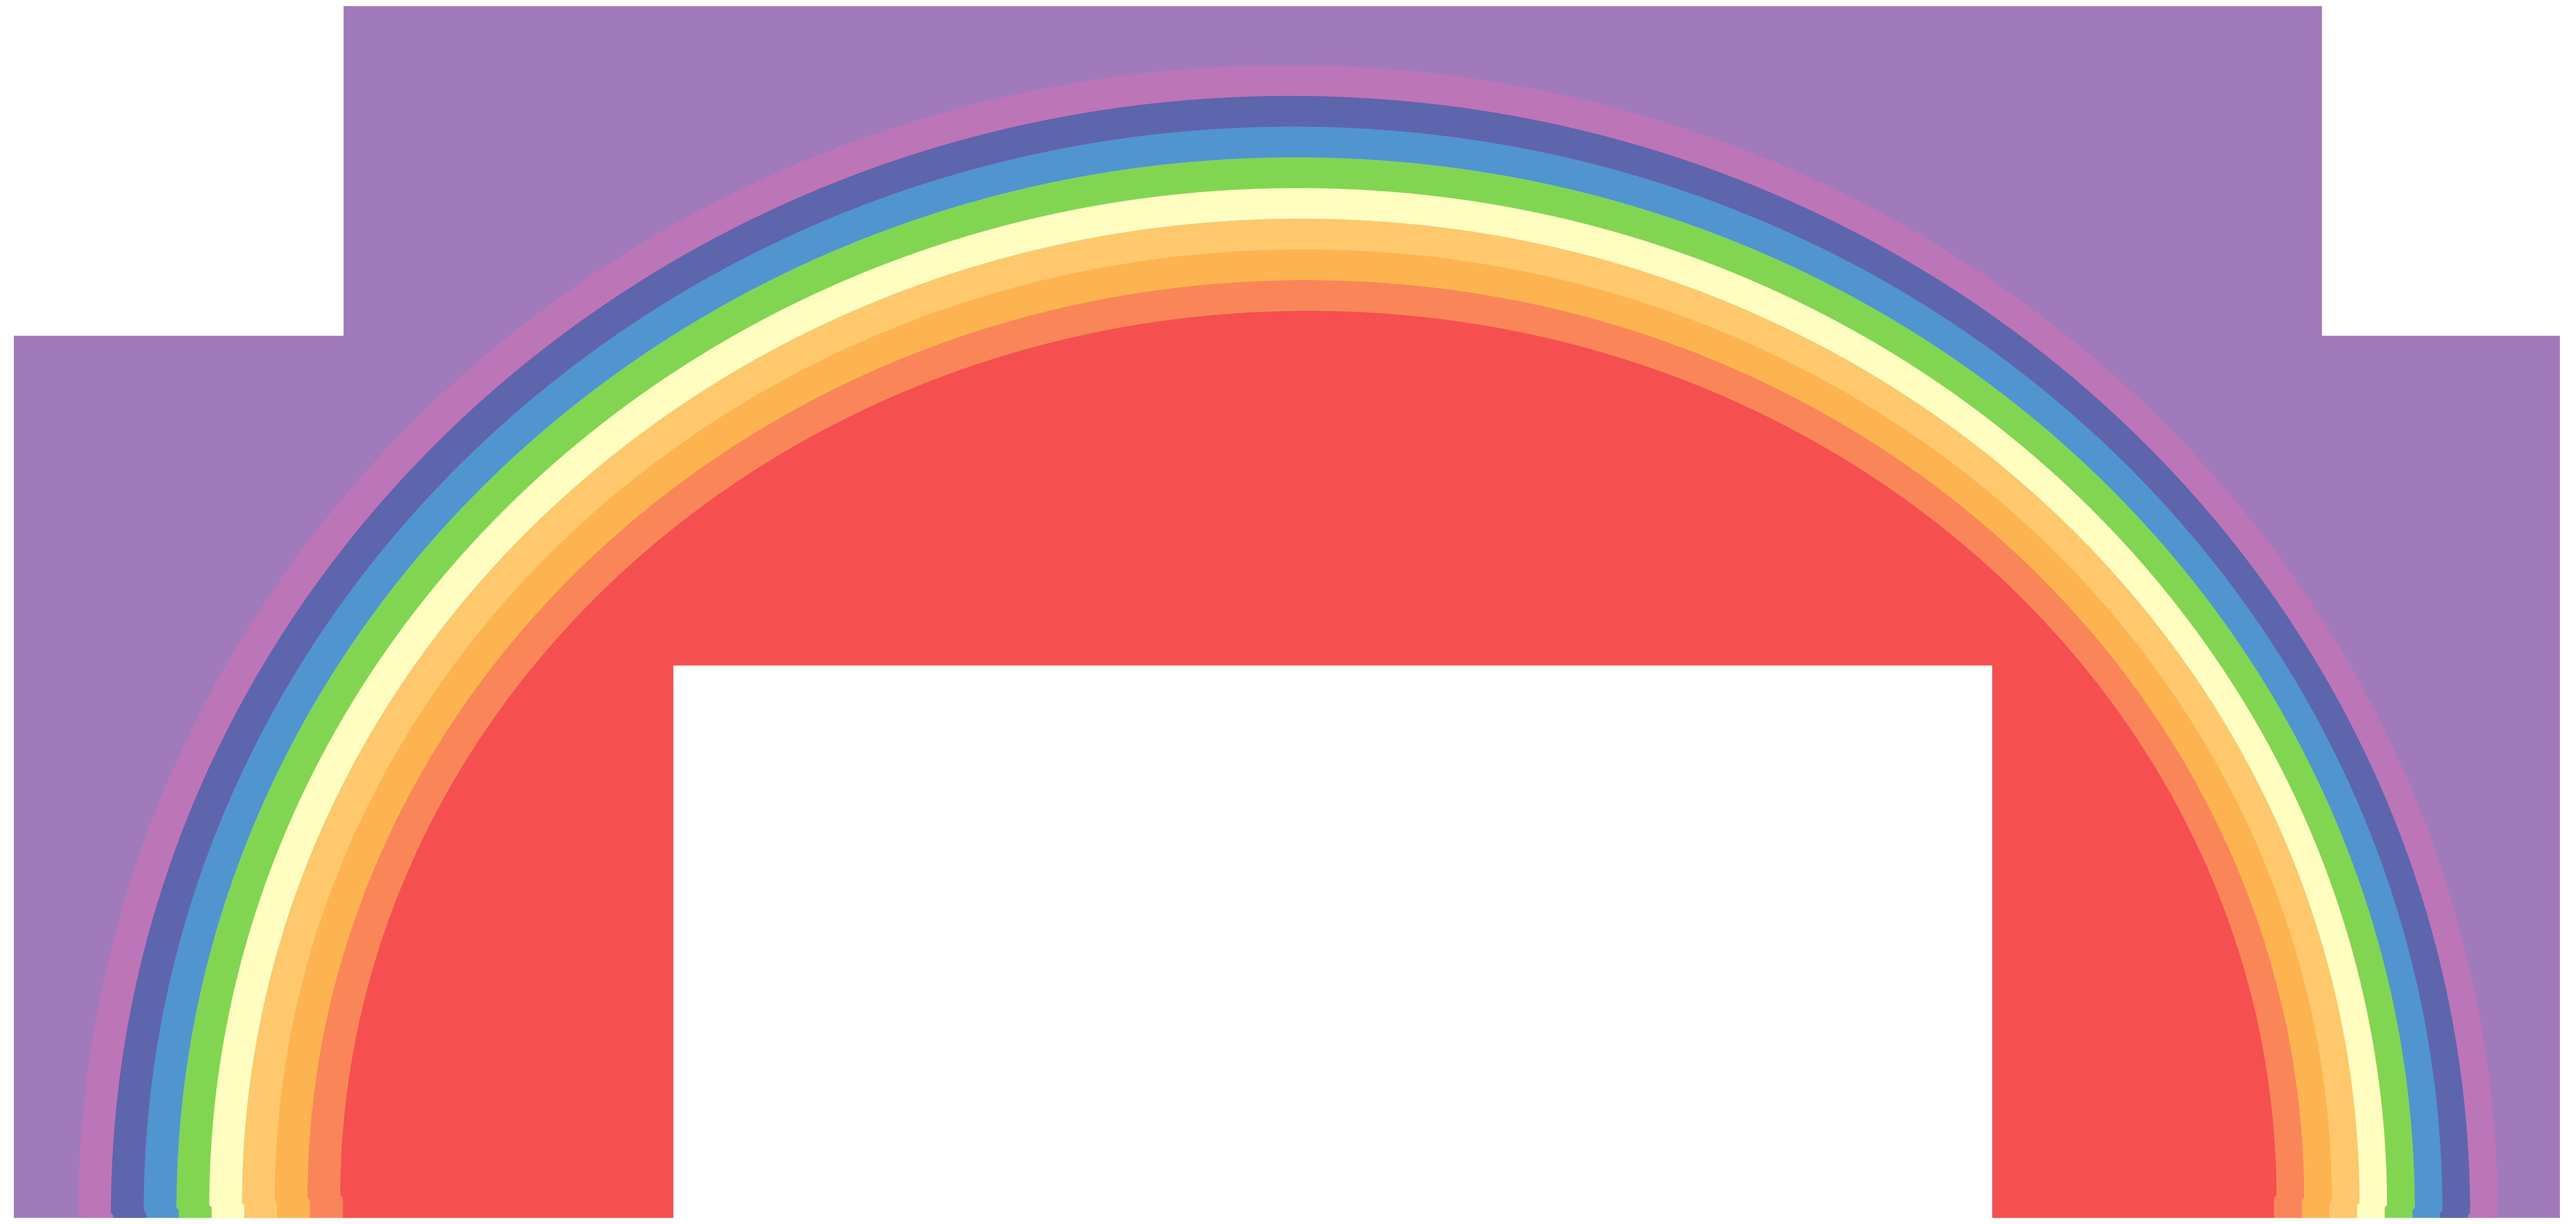 Rainbow Transparent PNG Clip Art Image.